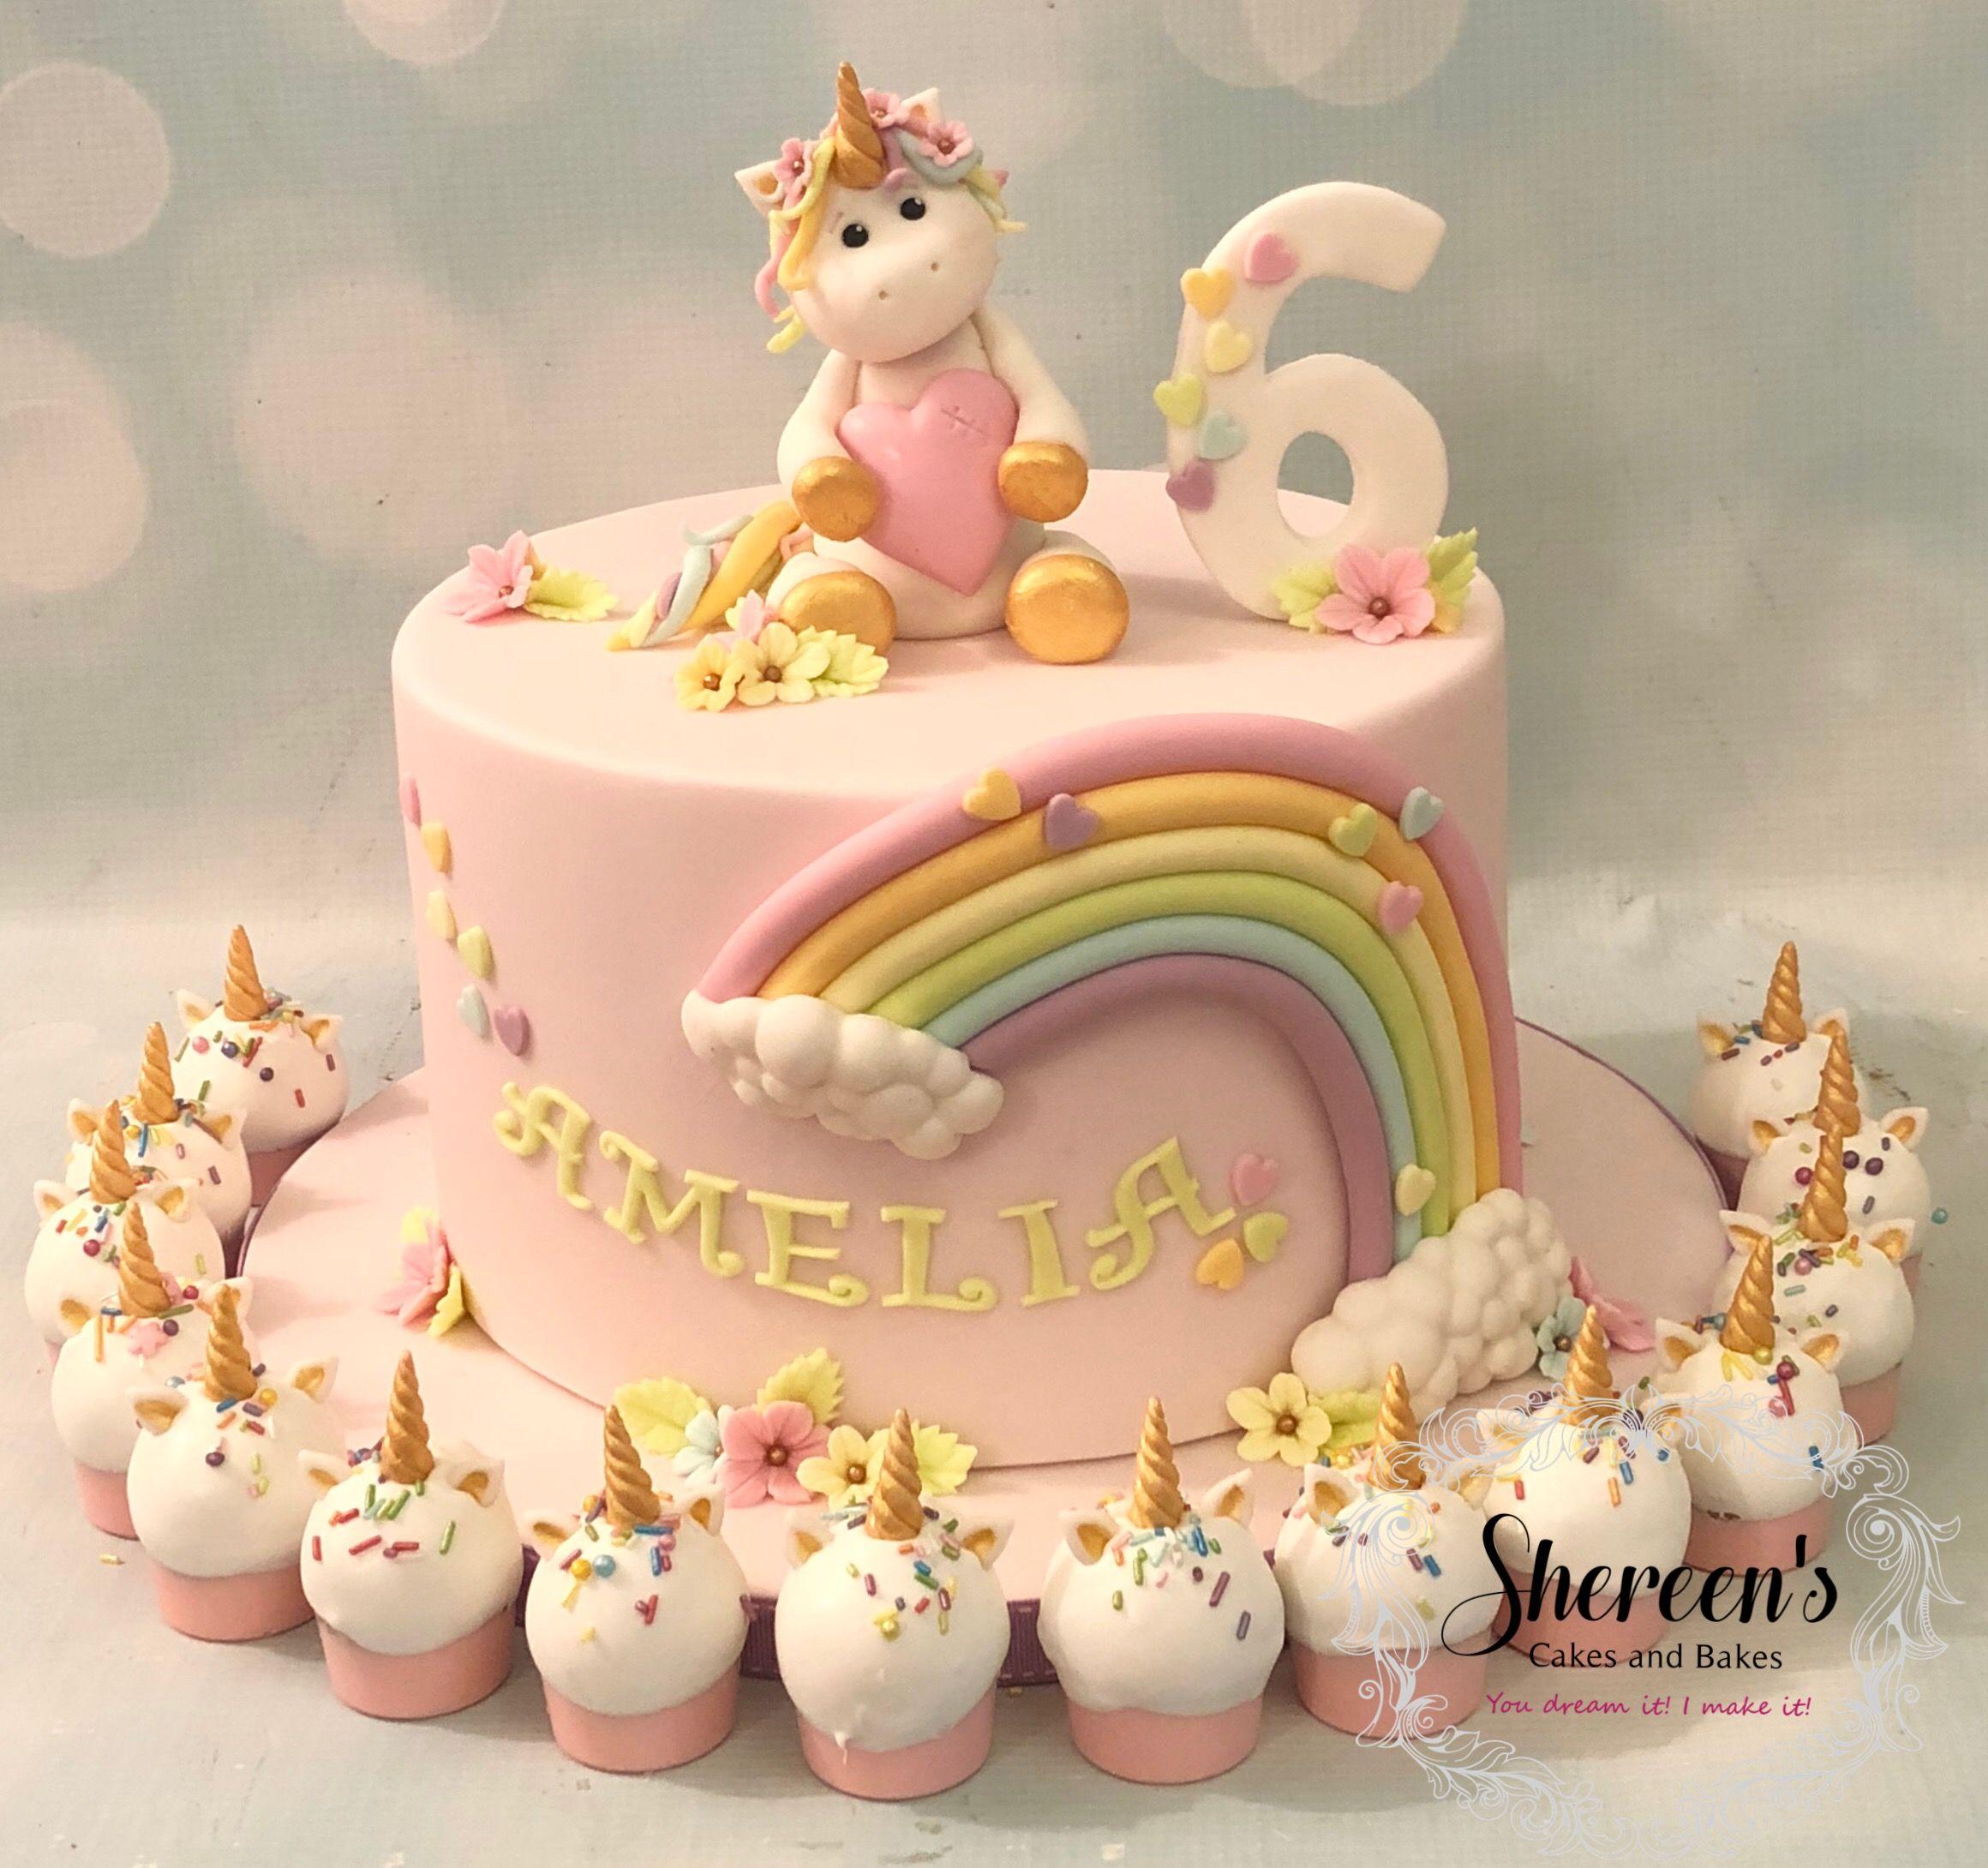 Fantastic Pastel Rainbow Unicorn Cake With Cake Bombs Pops Heart Birthday Funny Birthday Cards Online Kookostrdamsfinfo